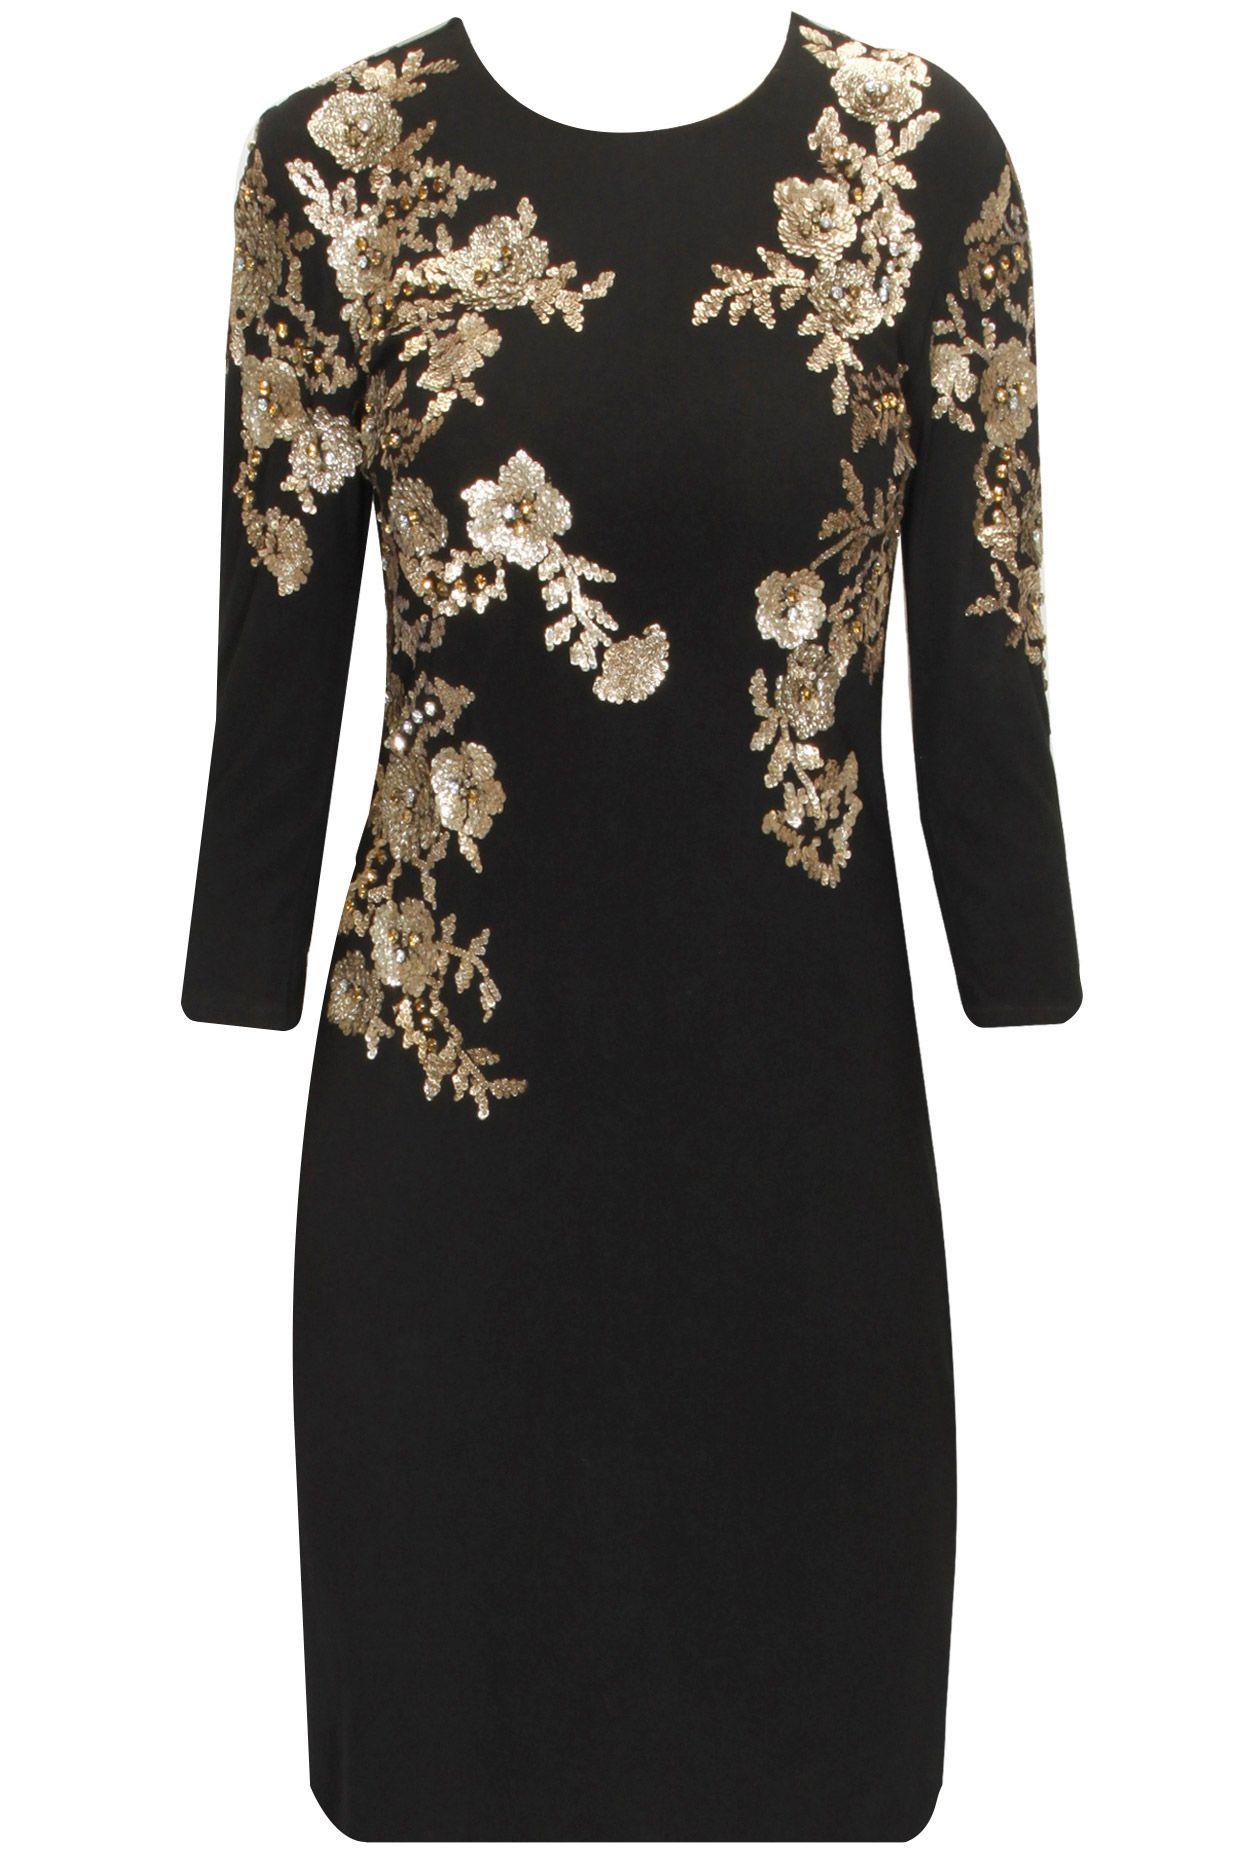 Namrata joshipura black sequins embroidered knee length dress